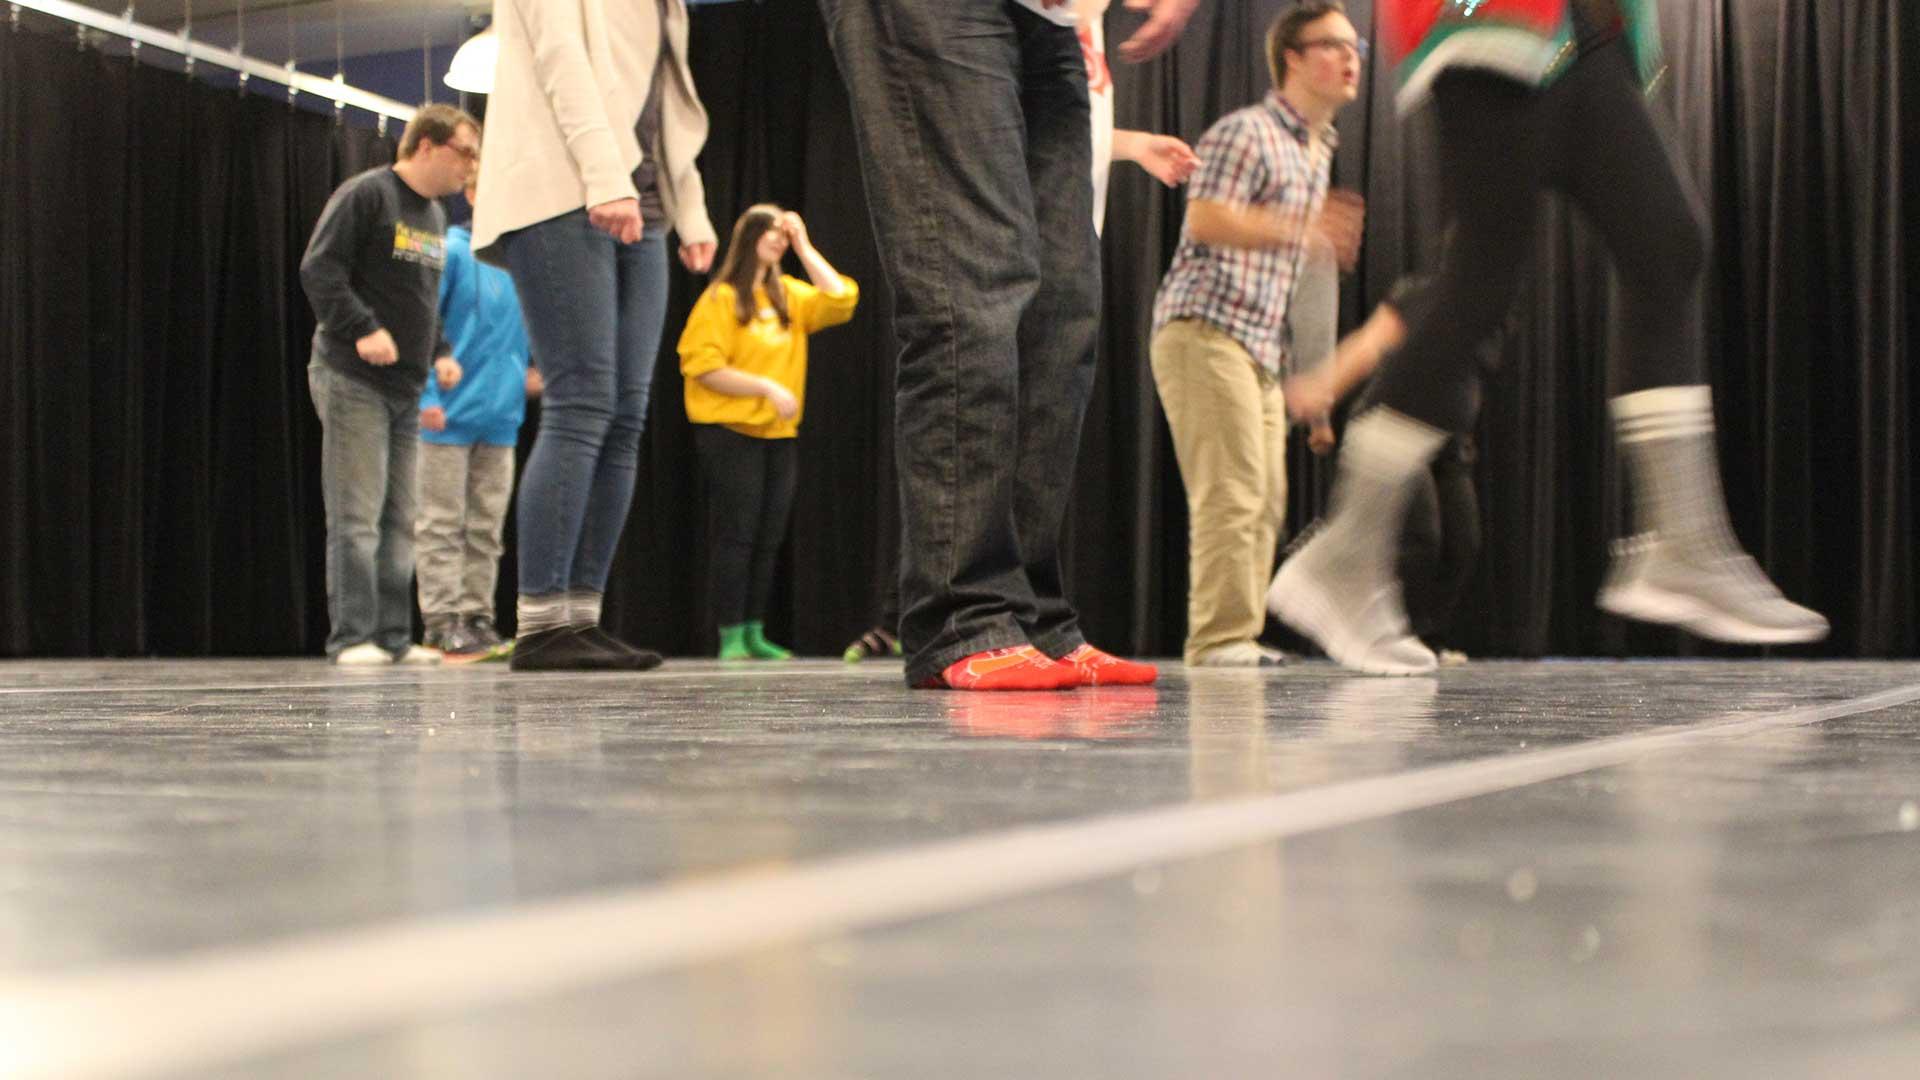 Socked feet and legs on dance floor